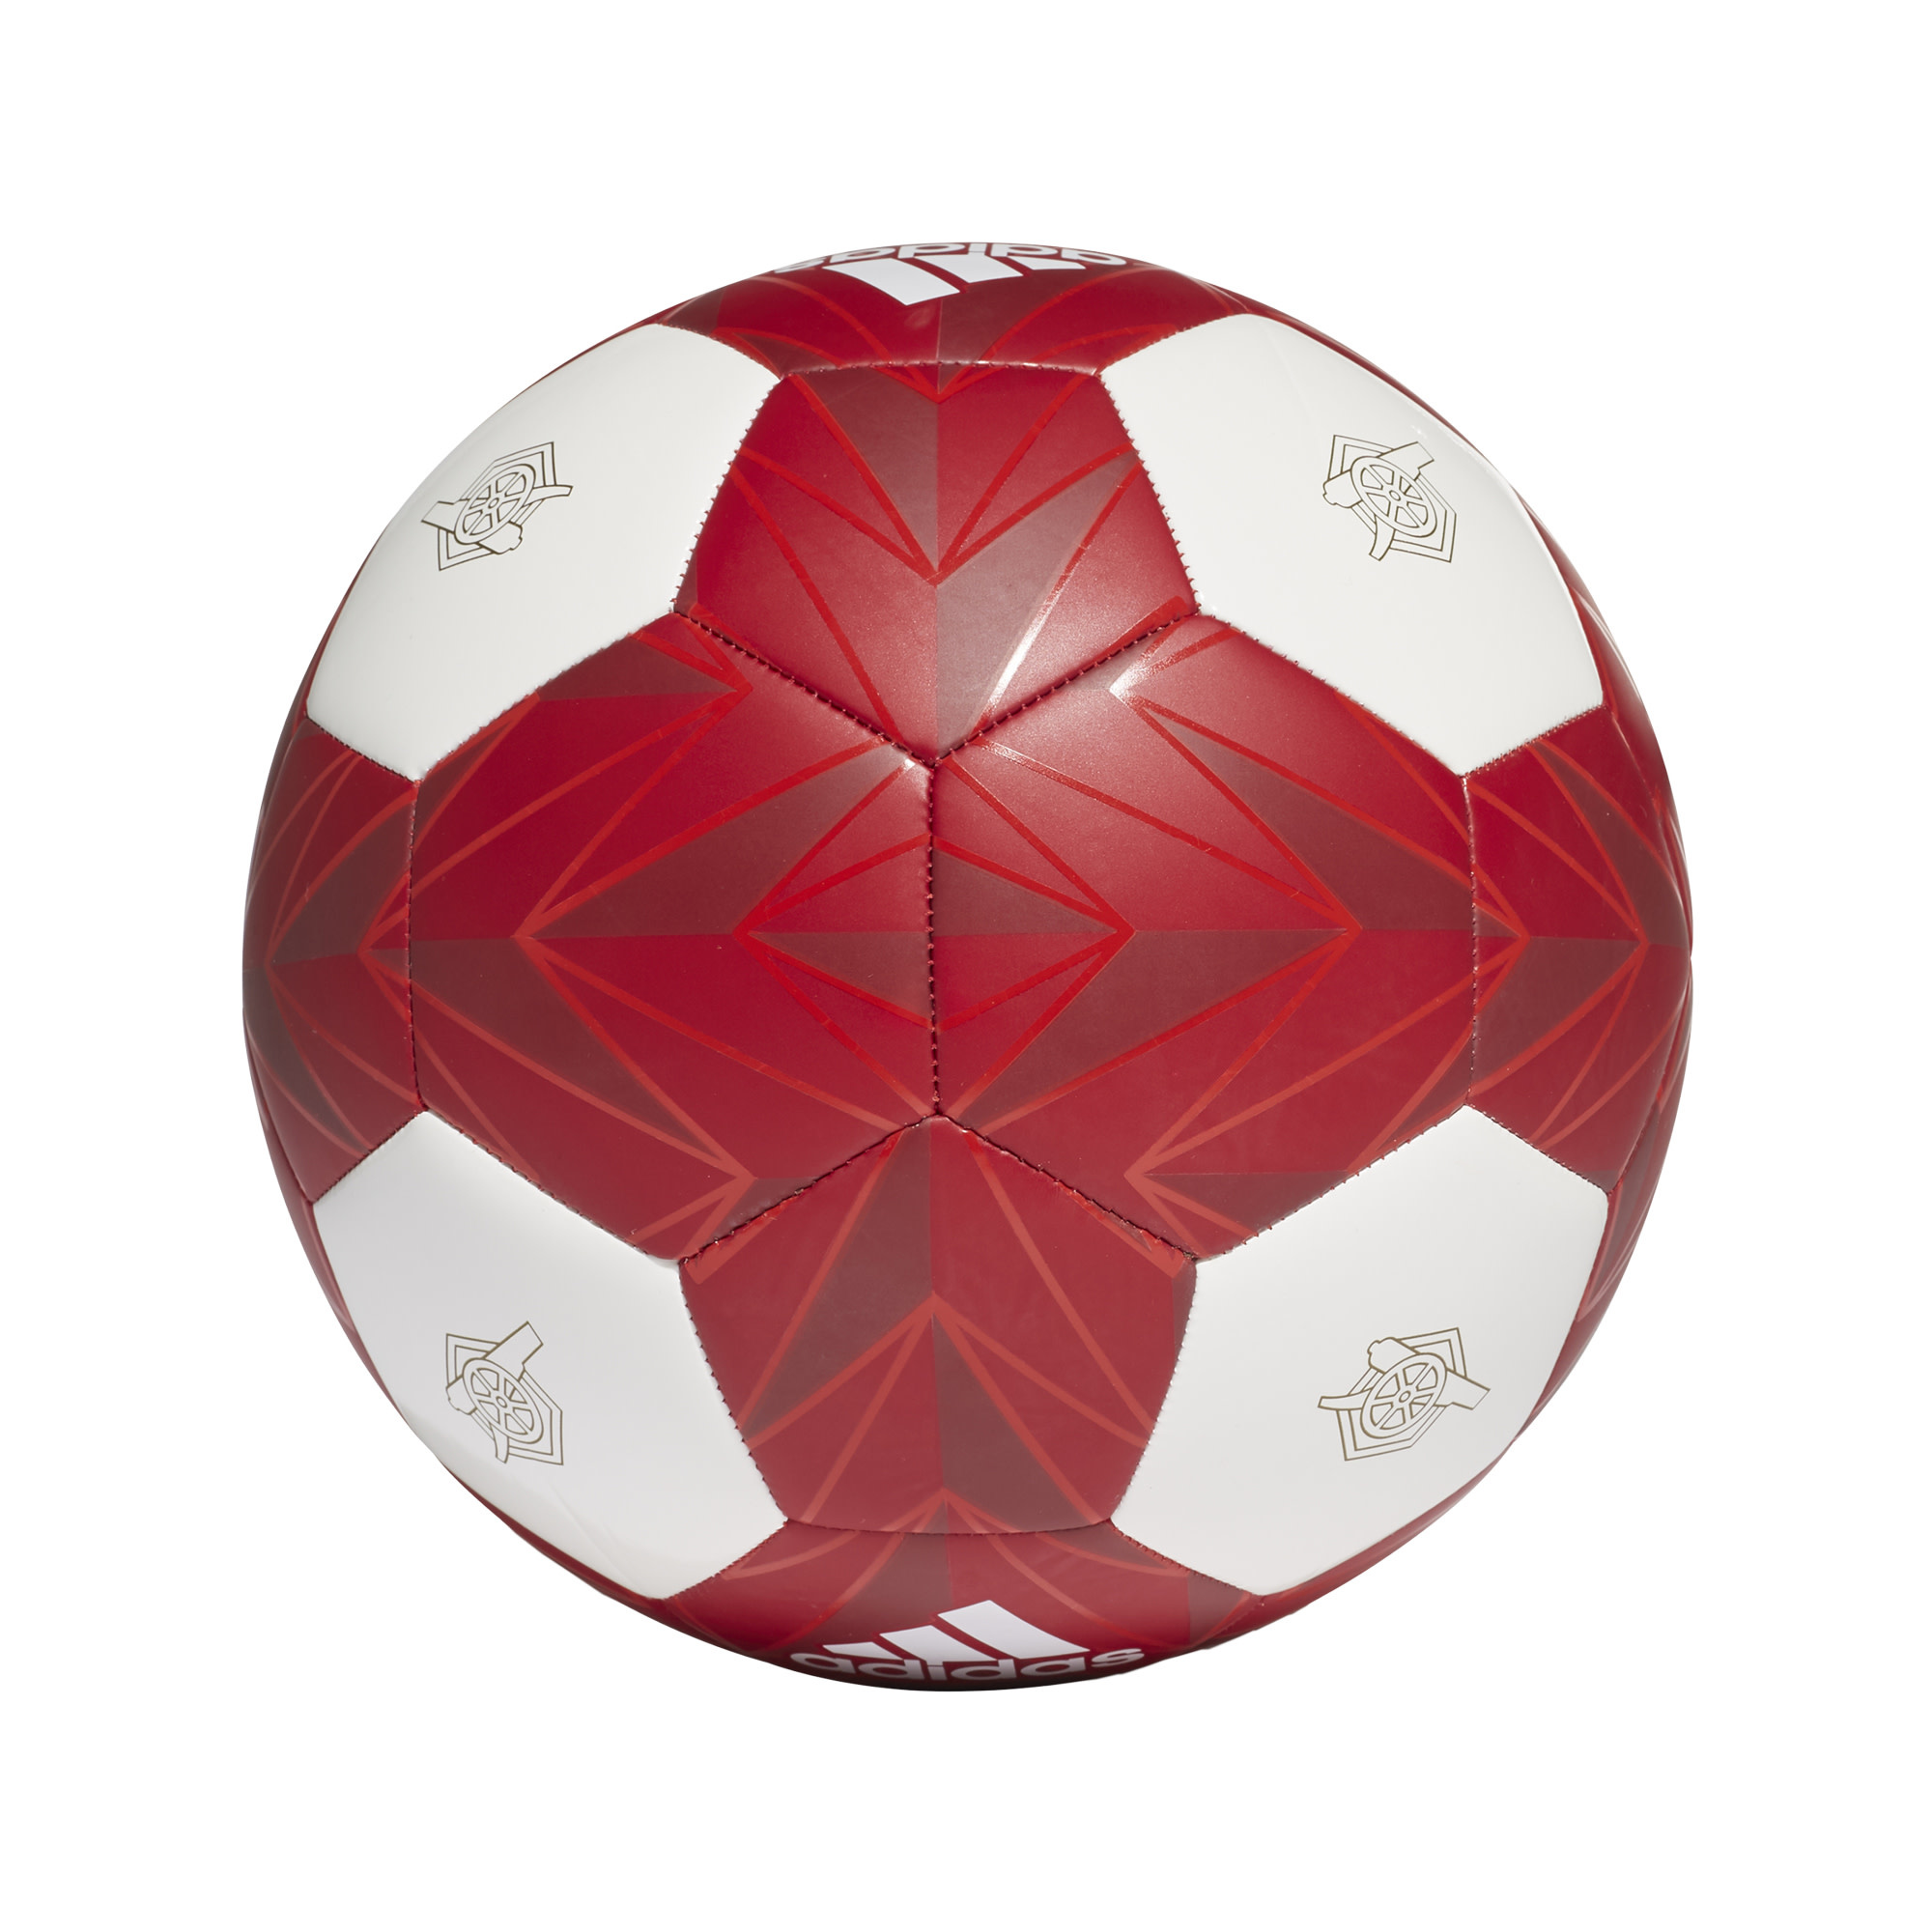 Adidas ADIDAS Arsenal Club Ball